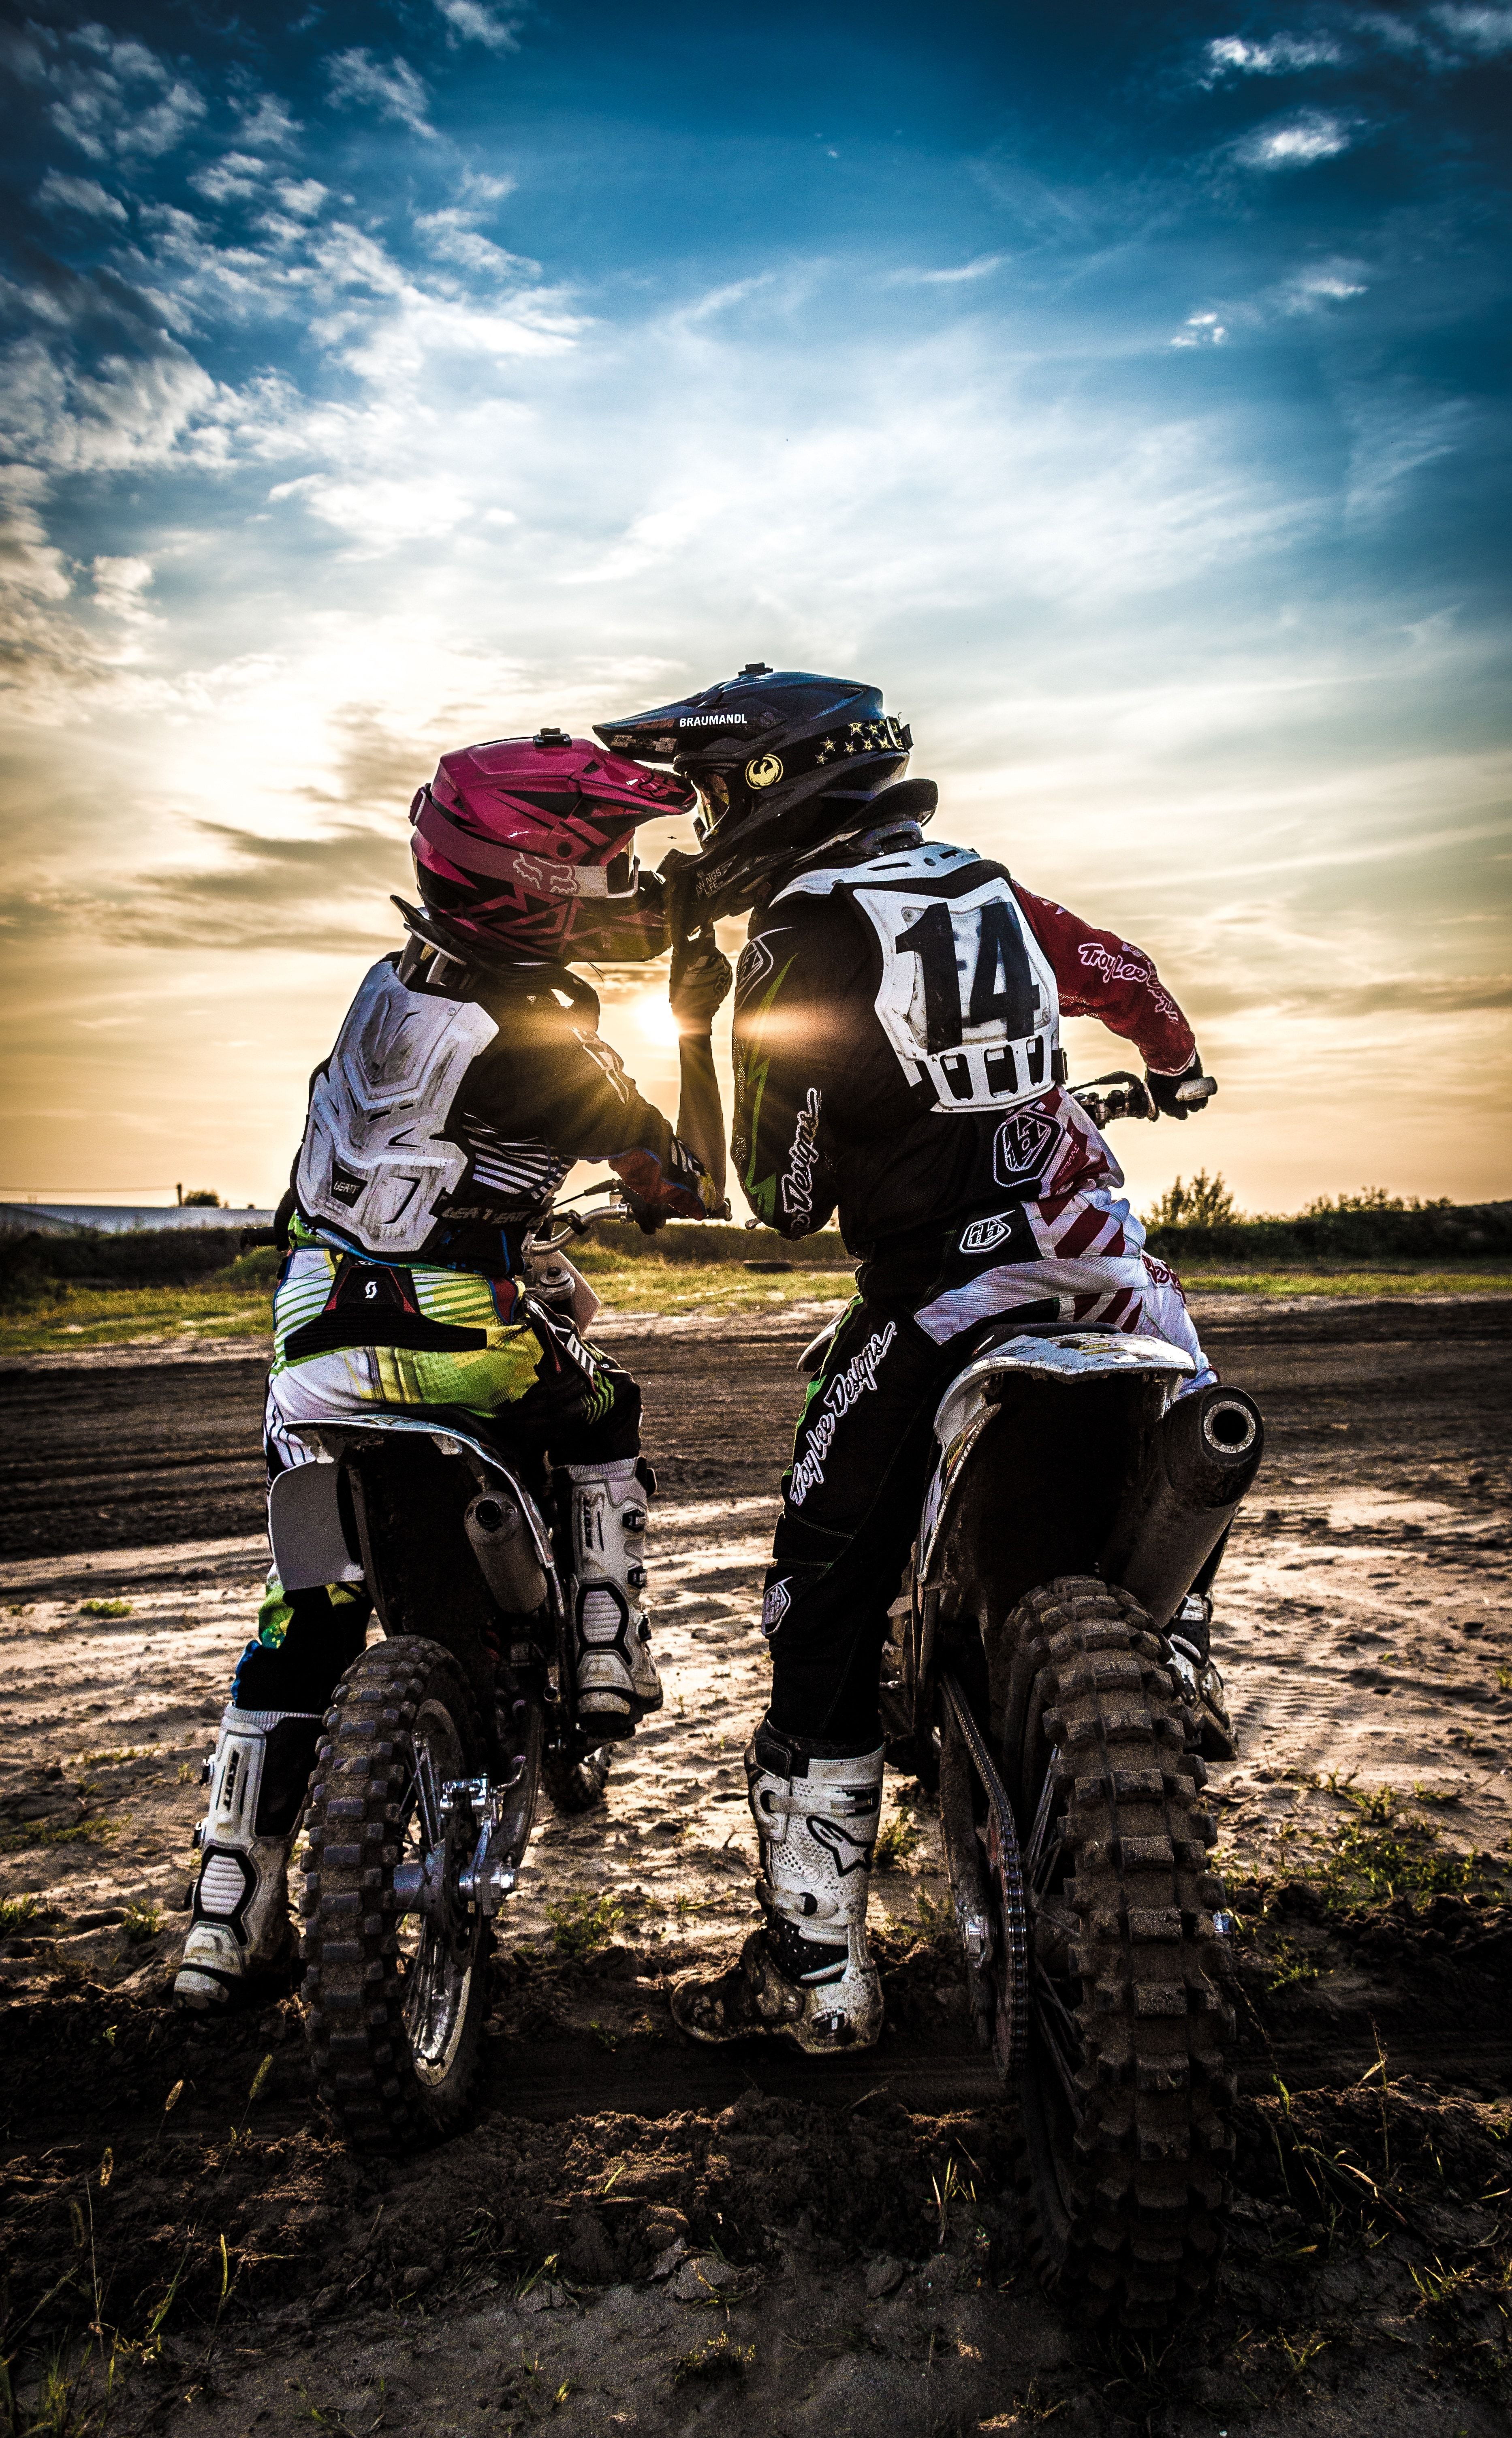 wallpaper motocross 4k celular di 2020 Sepeda motor